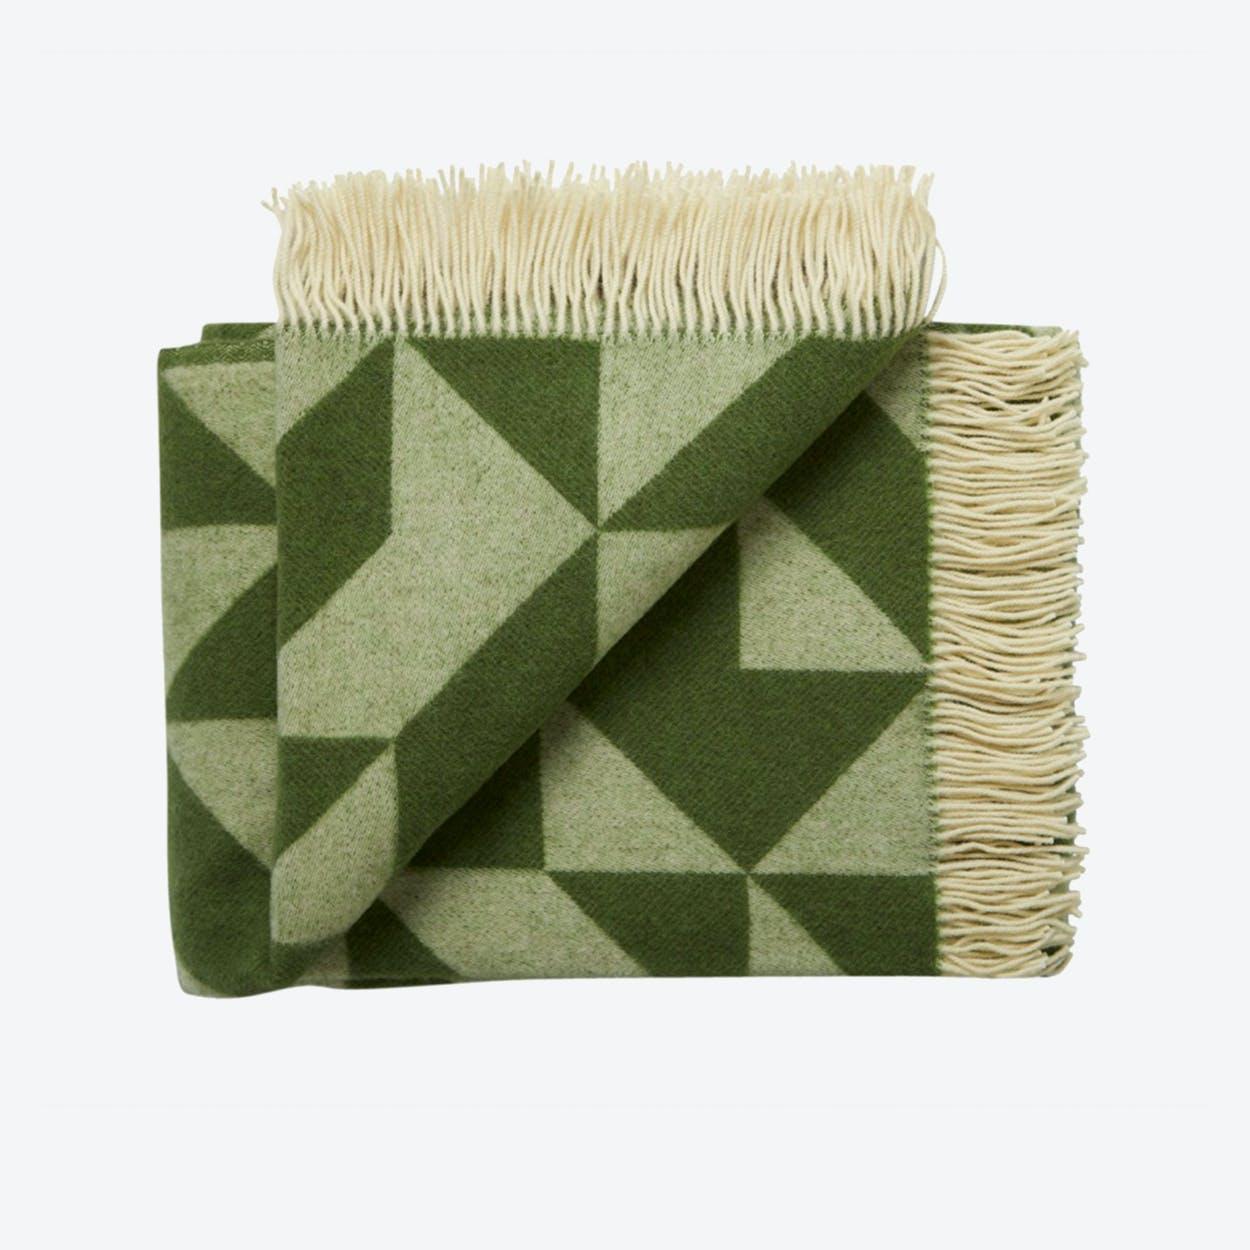 Twist A'Twill Wool Throw in Grass-Green